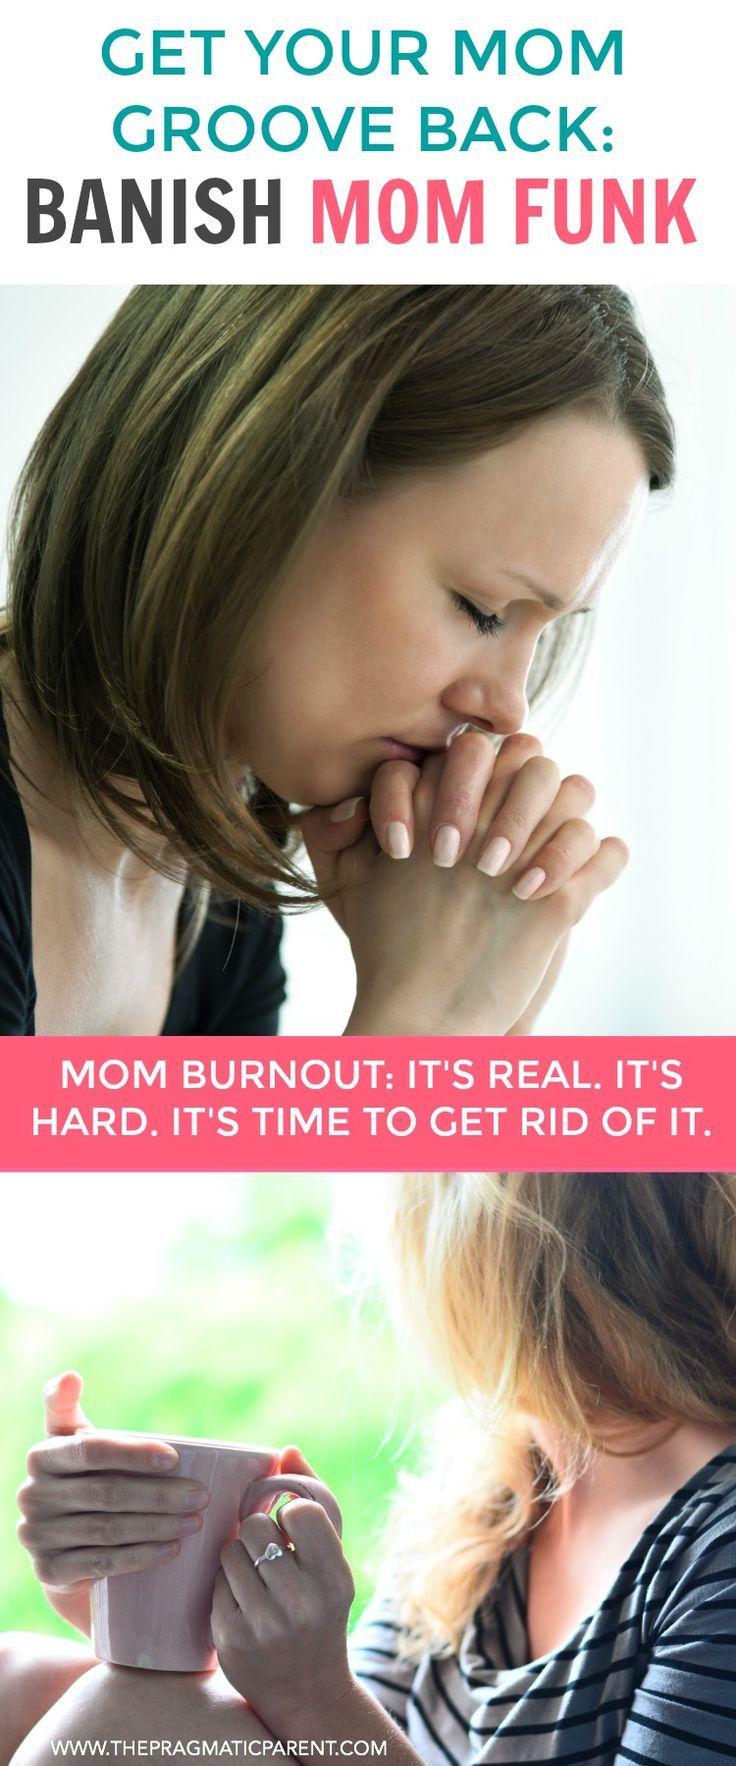 d90432fbe45a479f73484b7646d9d645 - How To Get Out Of Trouble With Your Mom